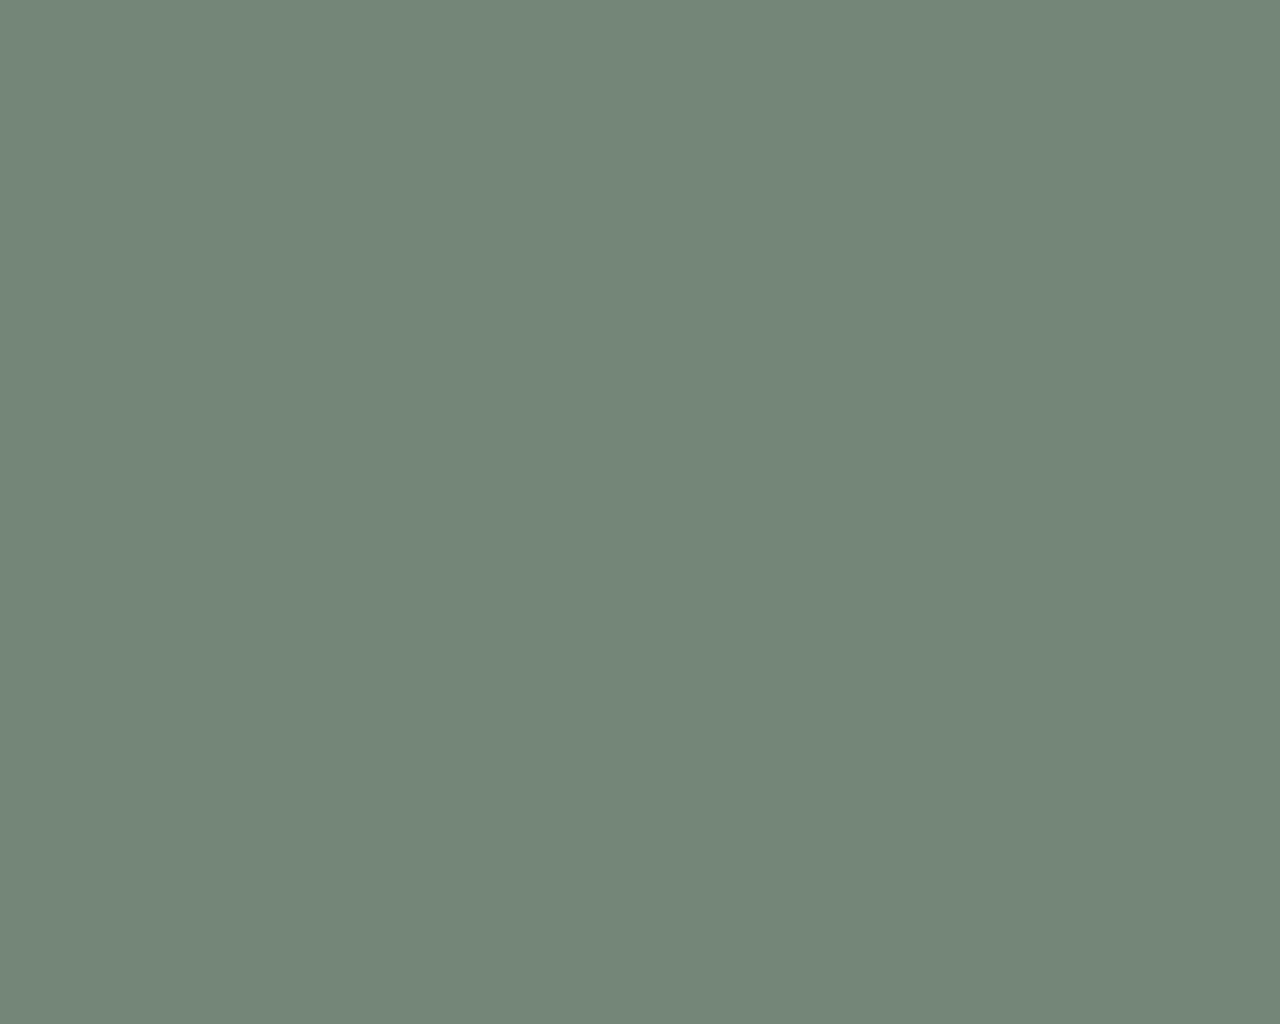 1280x1024 Xanadu Solid Color Background